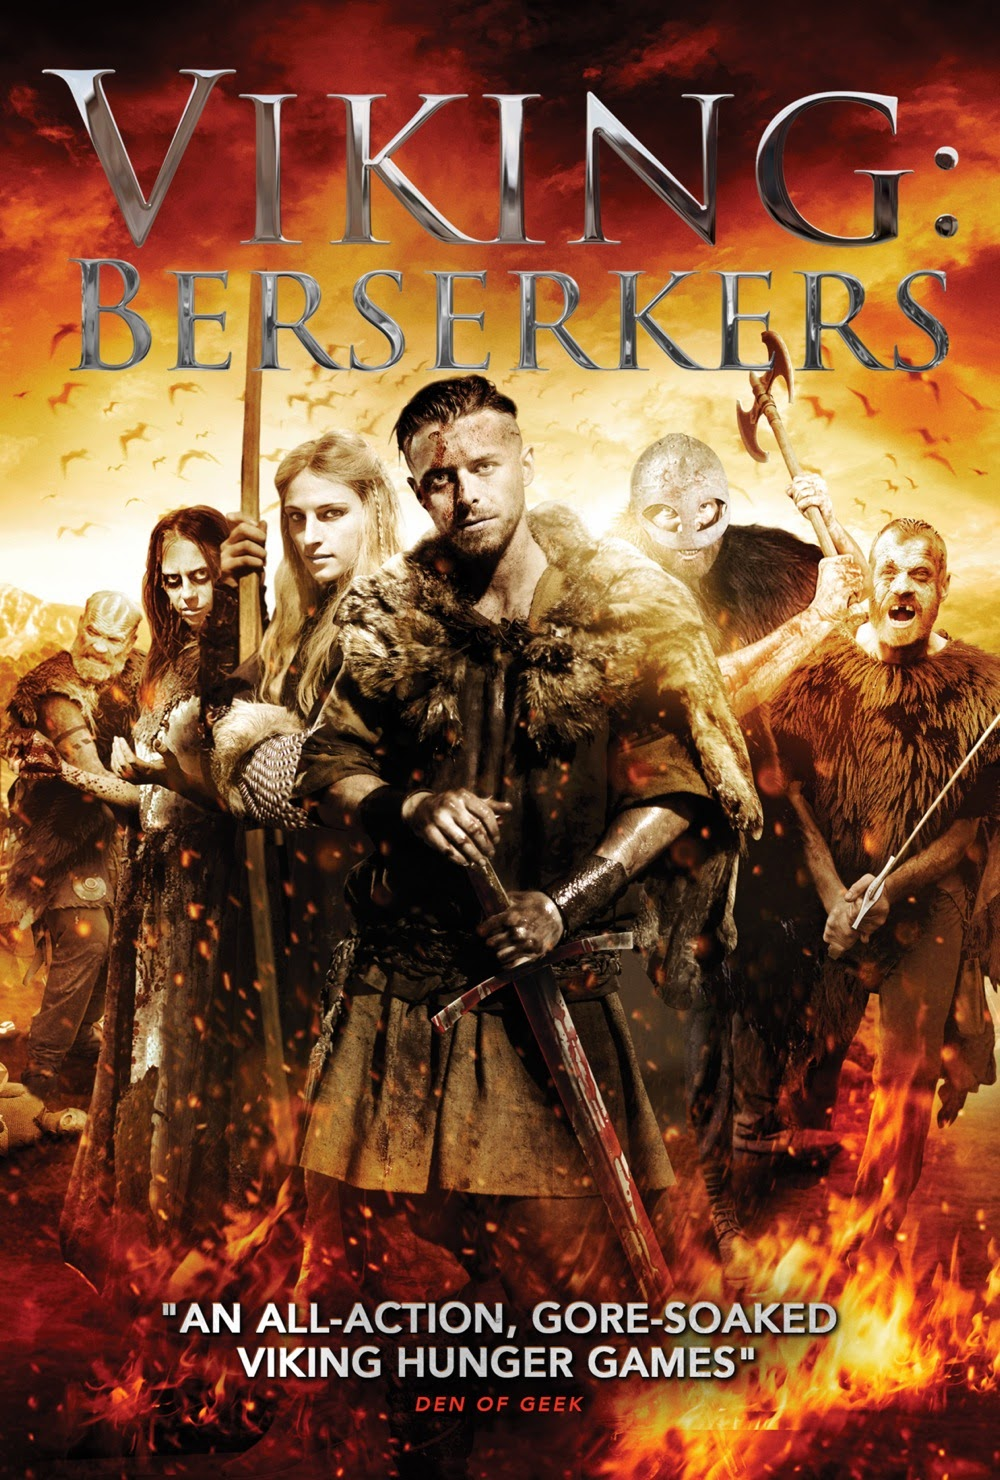 Viking: The Berserkers (2014)